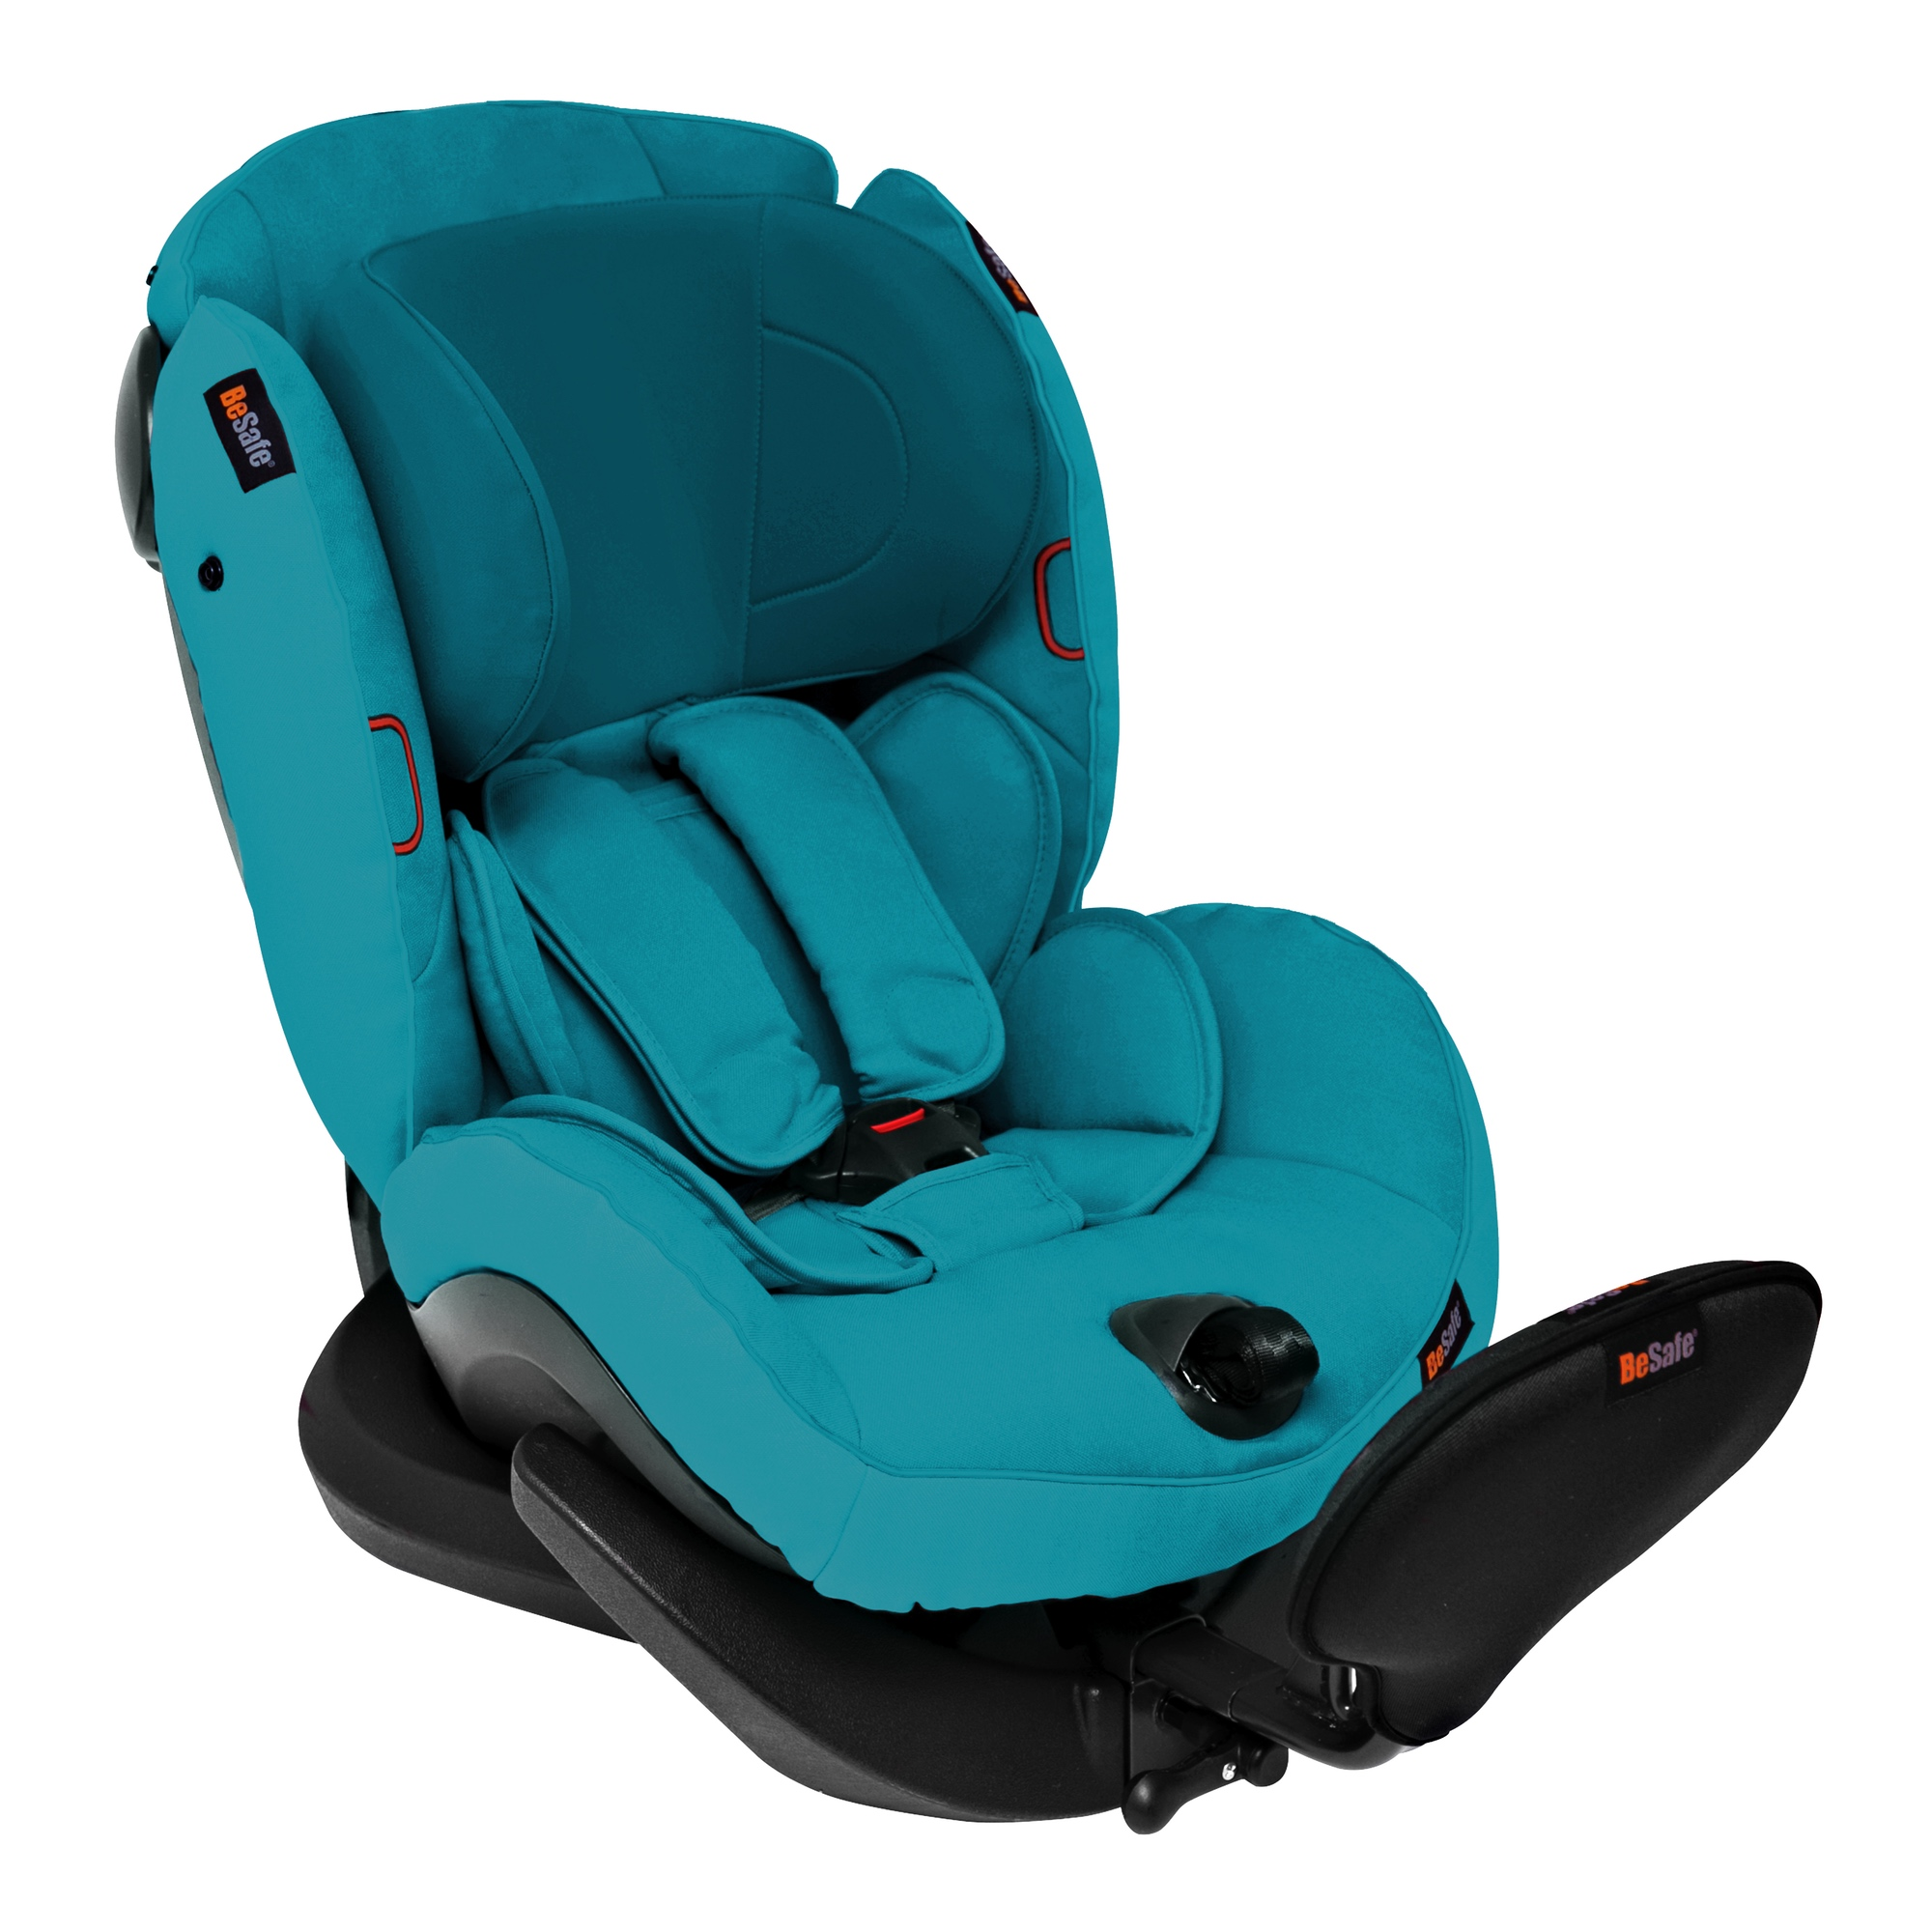 besafe izi plus reboard kindersitz die zwergperten babyschalen reboarder kindersitze. Black Bedroom Furniture Sets. Home Design Ideas